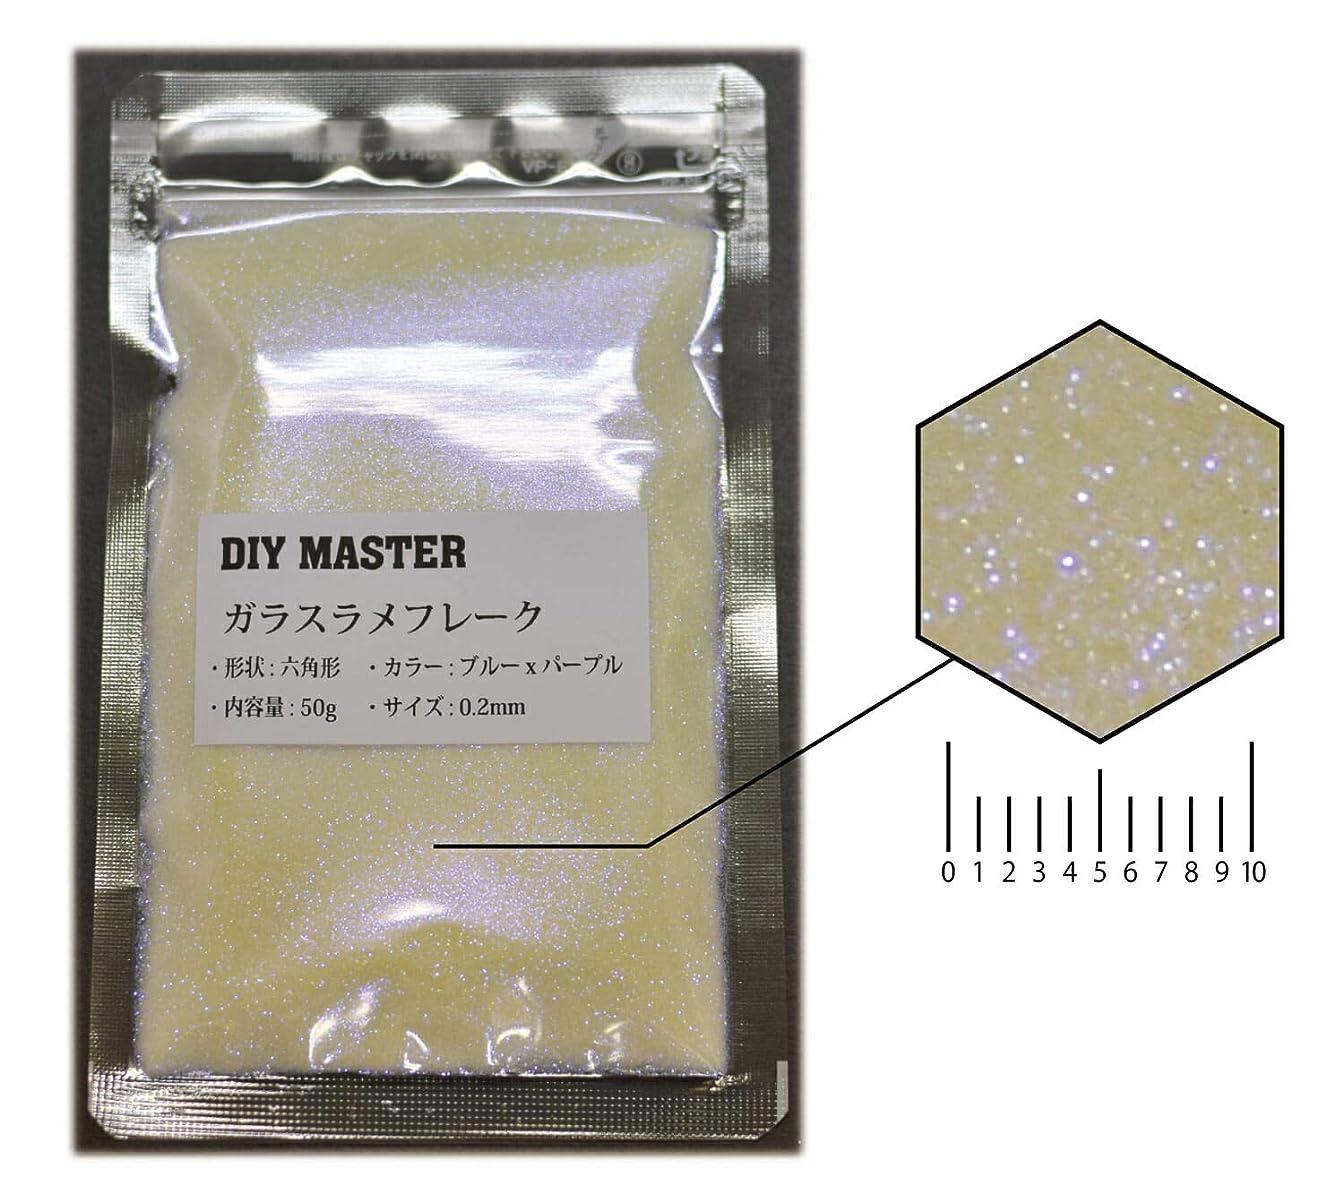 DIY MASTER ガラスラメフレーク (偏光) ブルーxパープル 0.2mm 50g